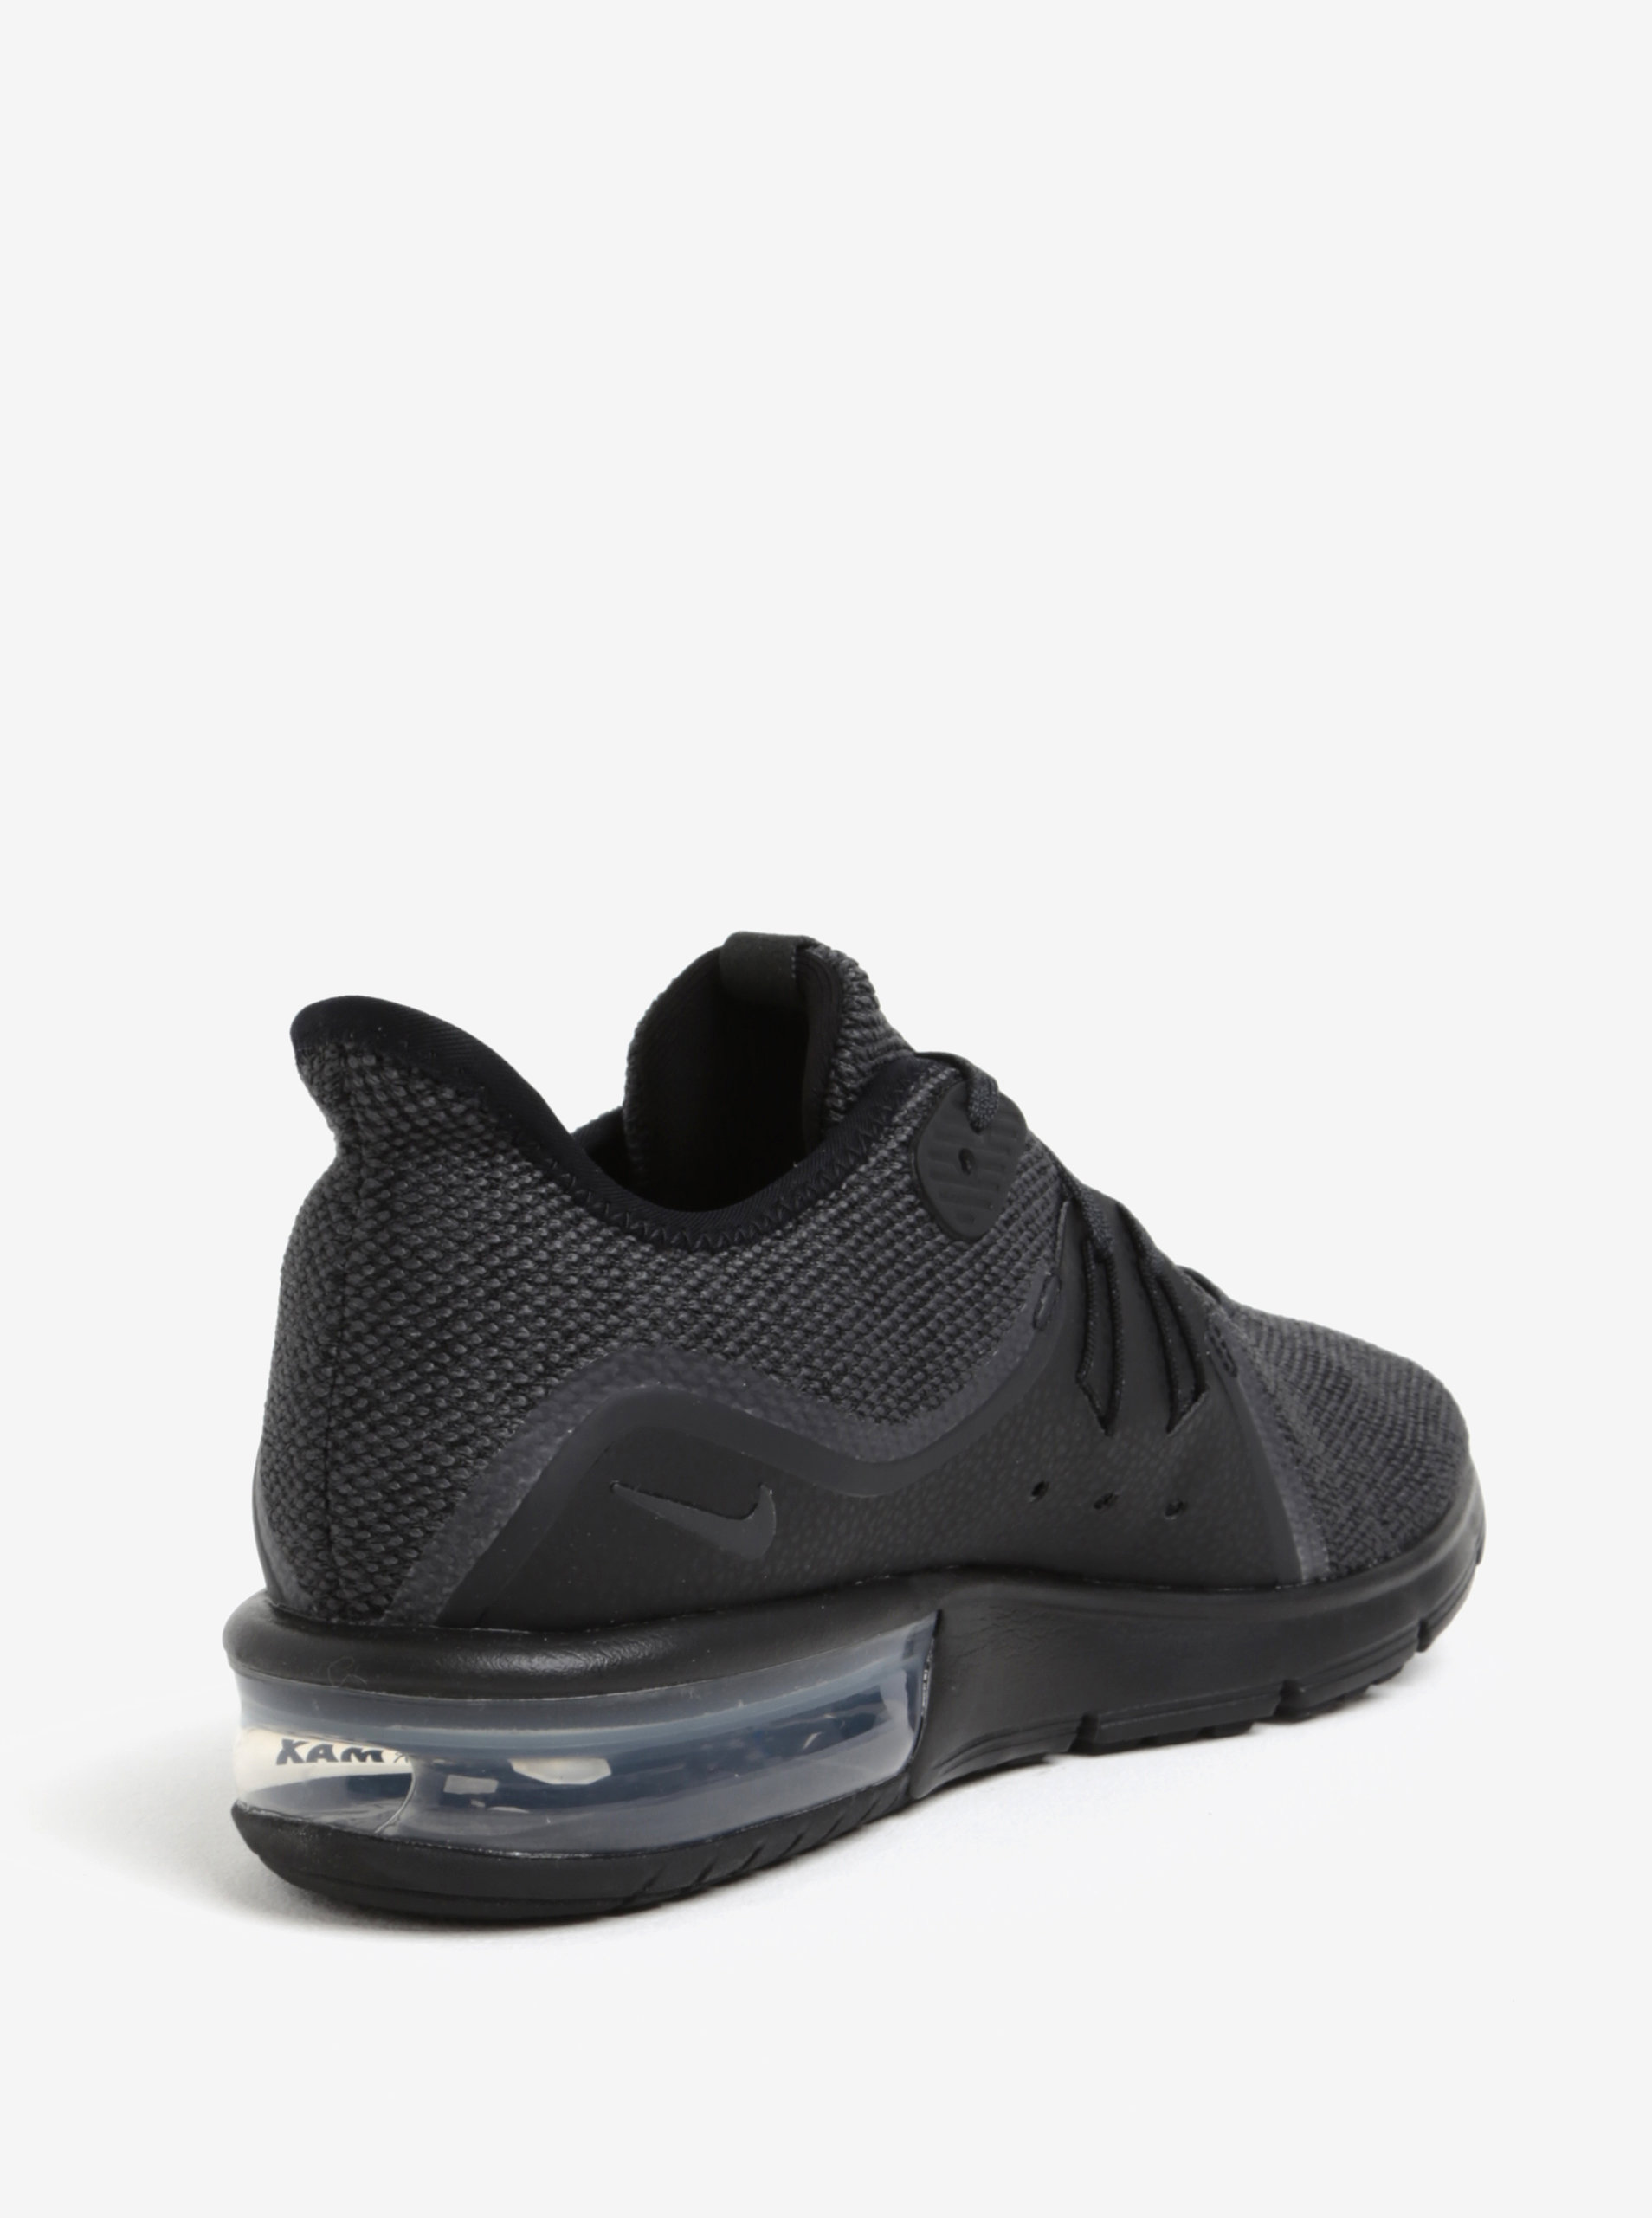 819413772ac Čierne pánske tenisky Nike Air Max Sequent 3 Running Shoe ...